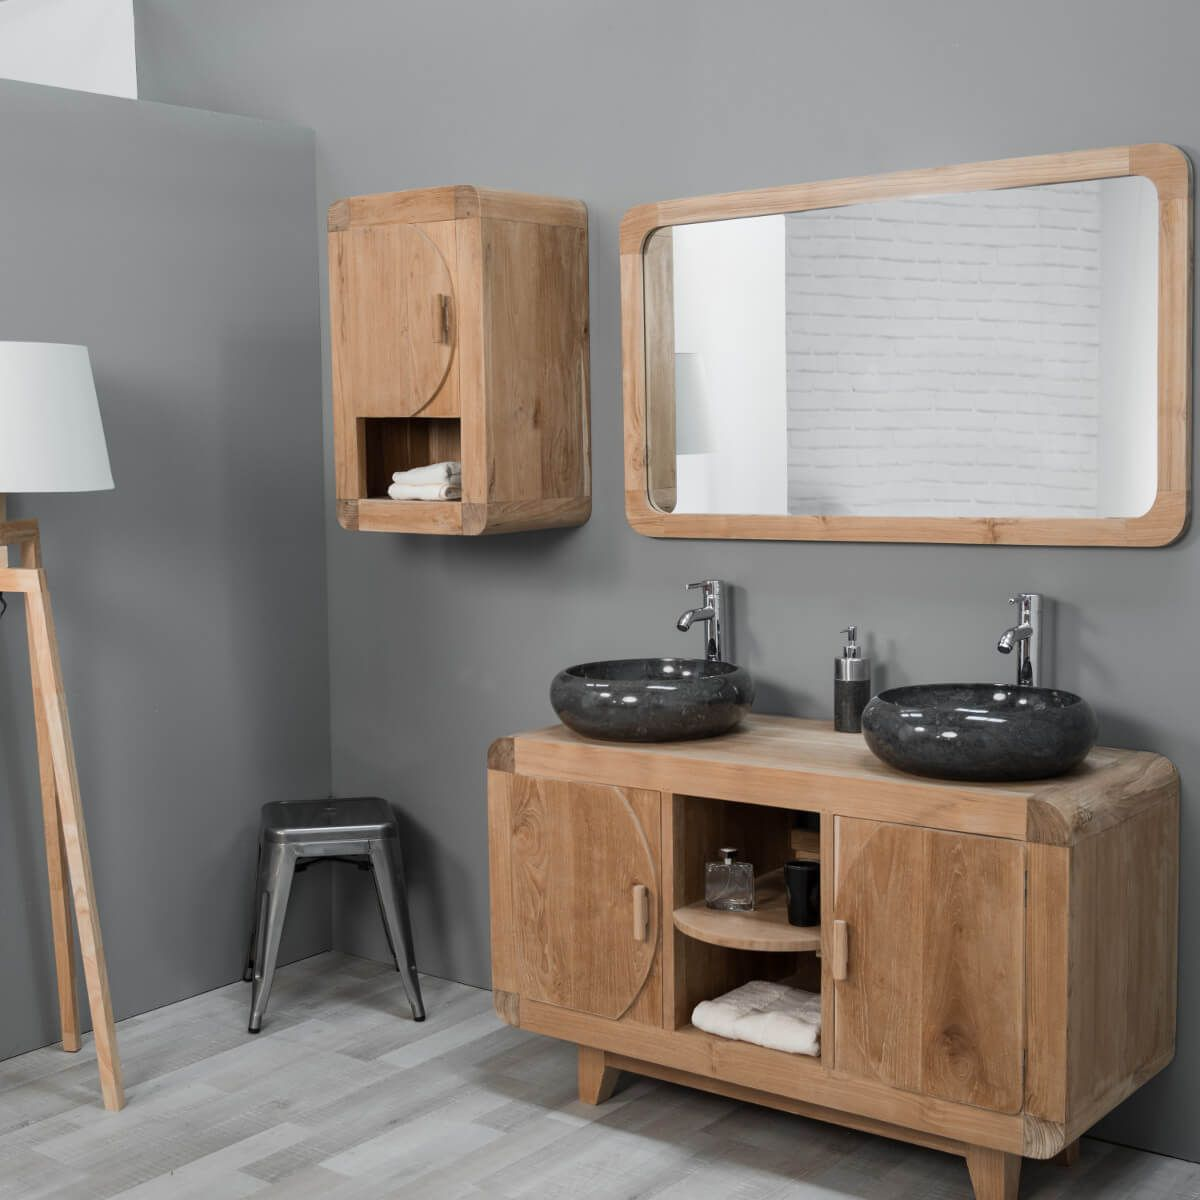 Armoire De Toilette Salle De Bain Ikea Meuble Vasque Salle De Bain Design Meuble Salle De Bain